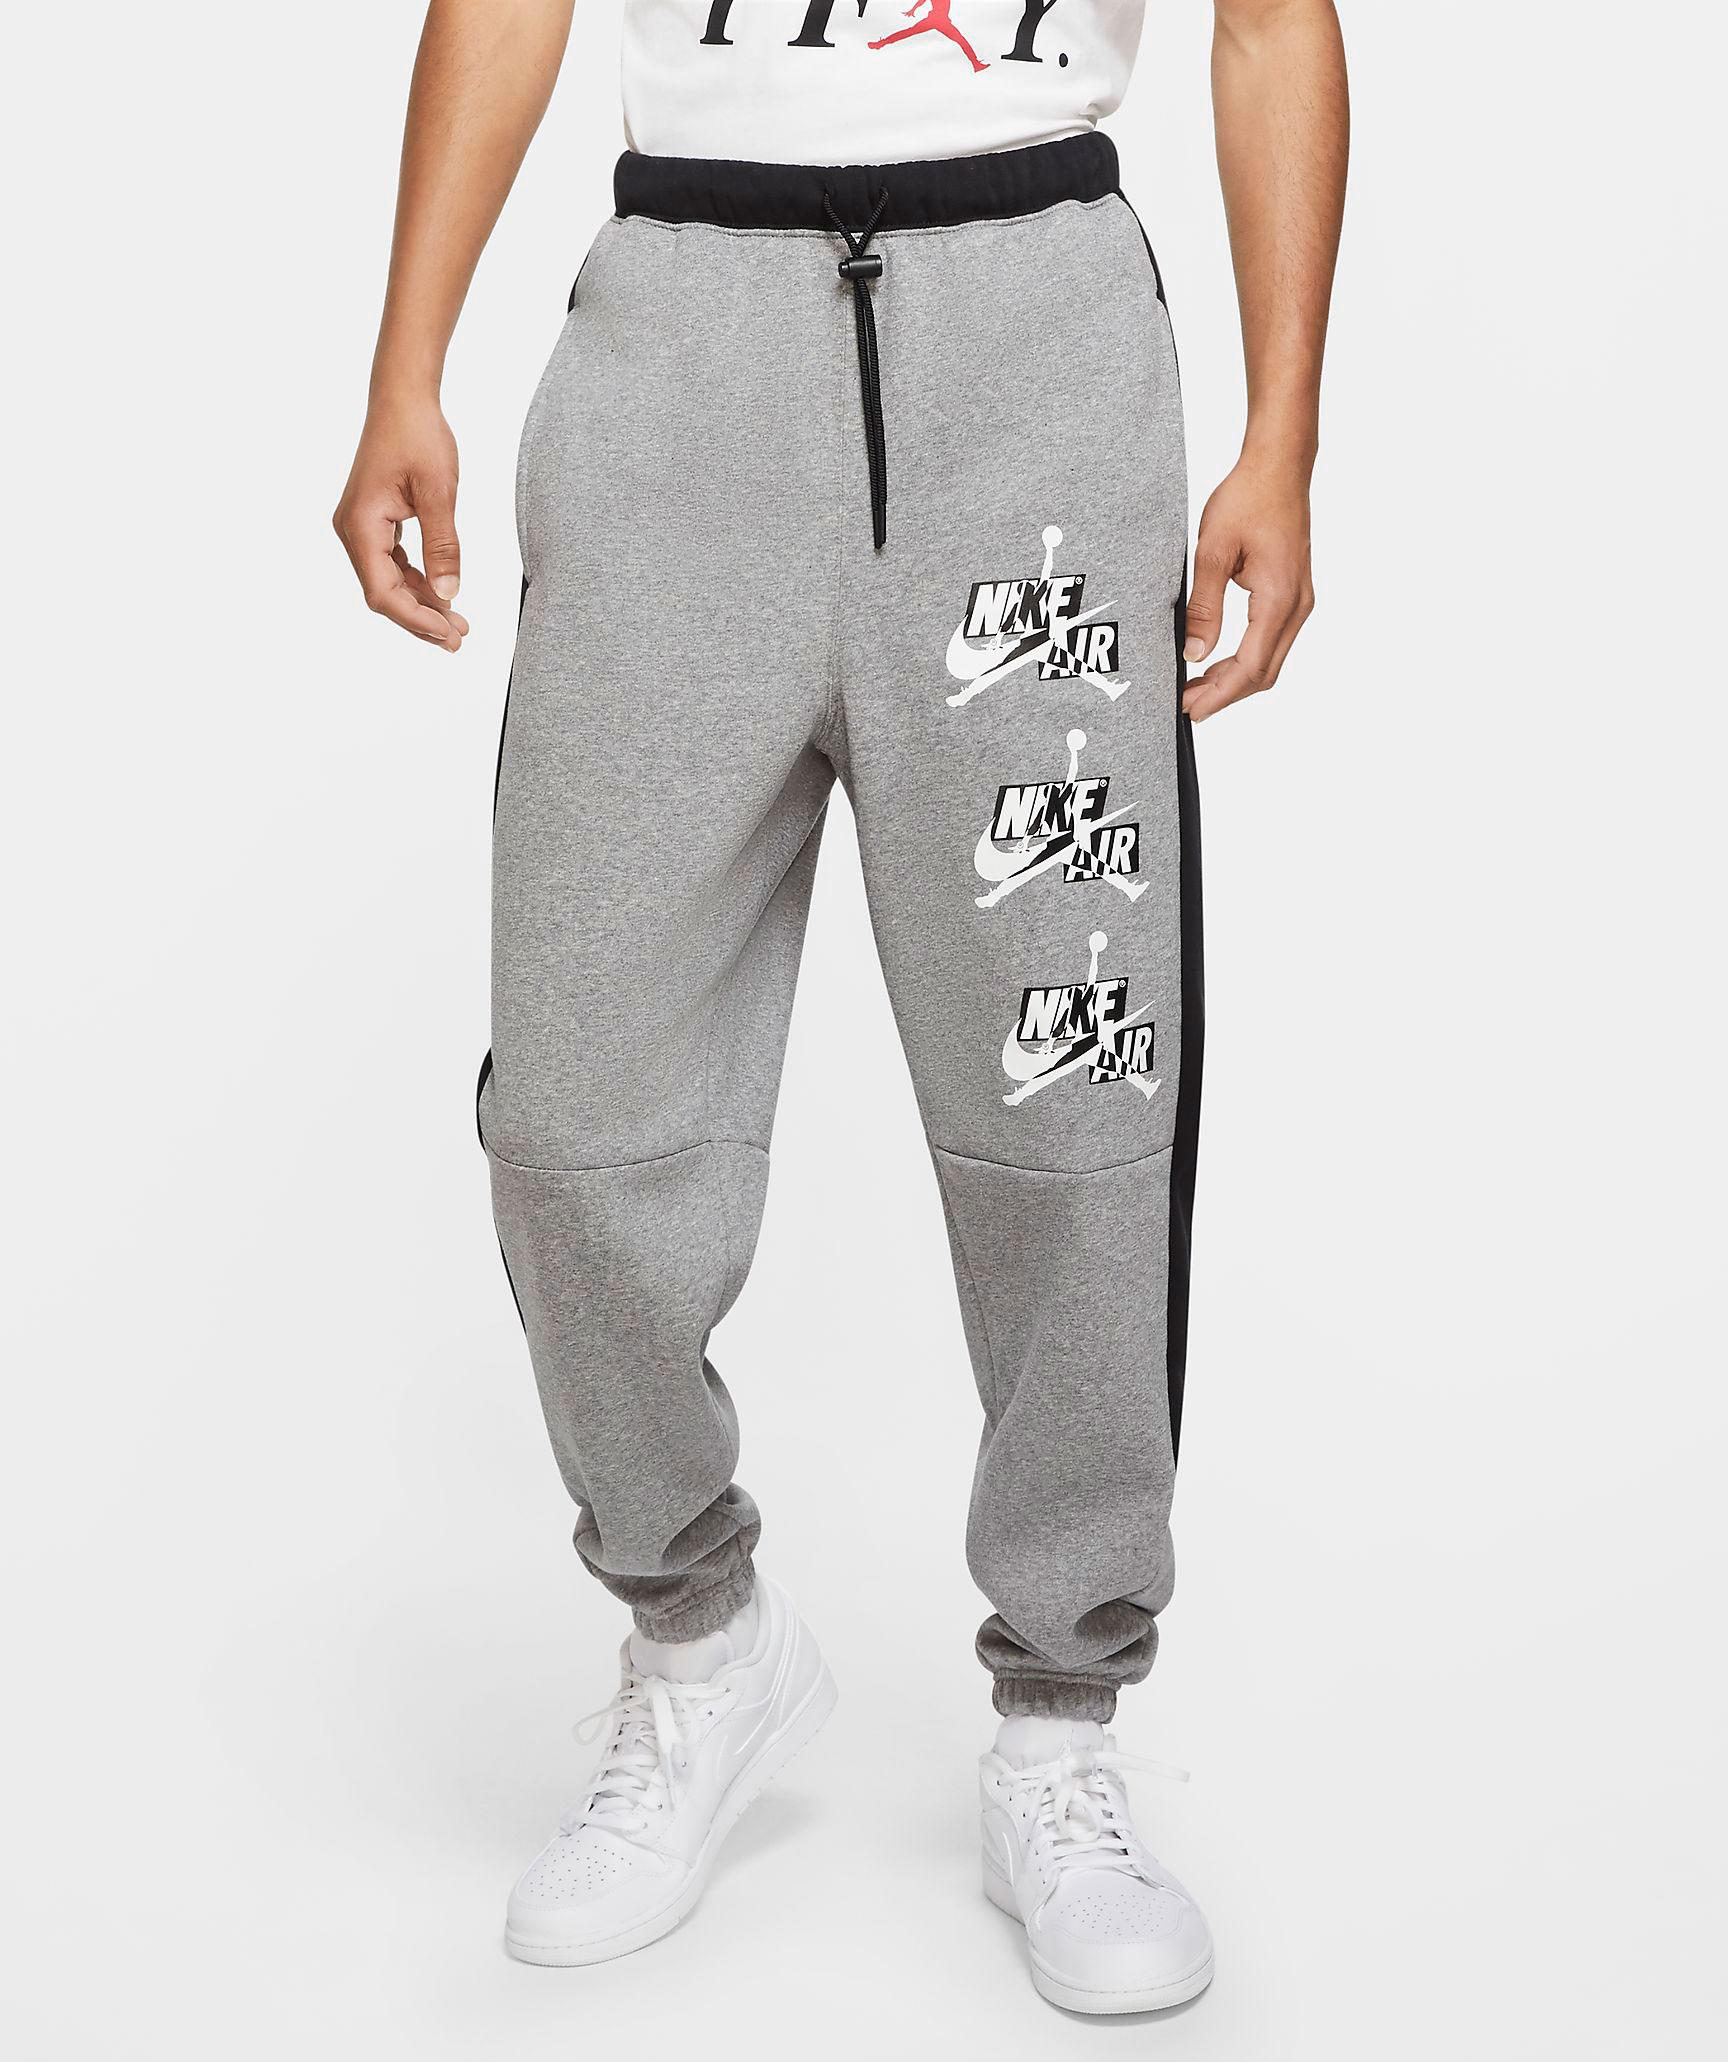 air-jordan-3-blue-cement-pants-match